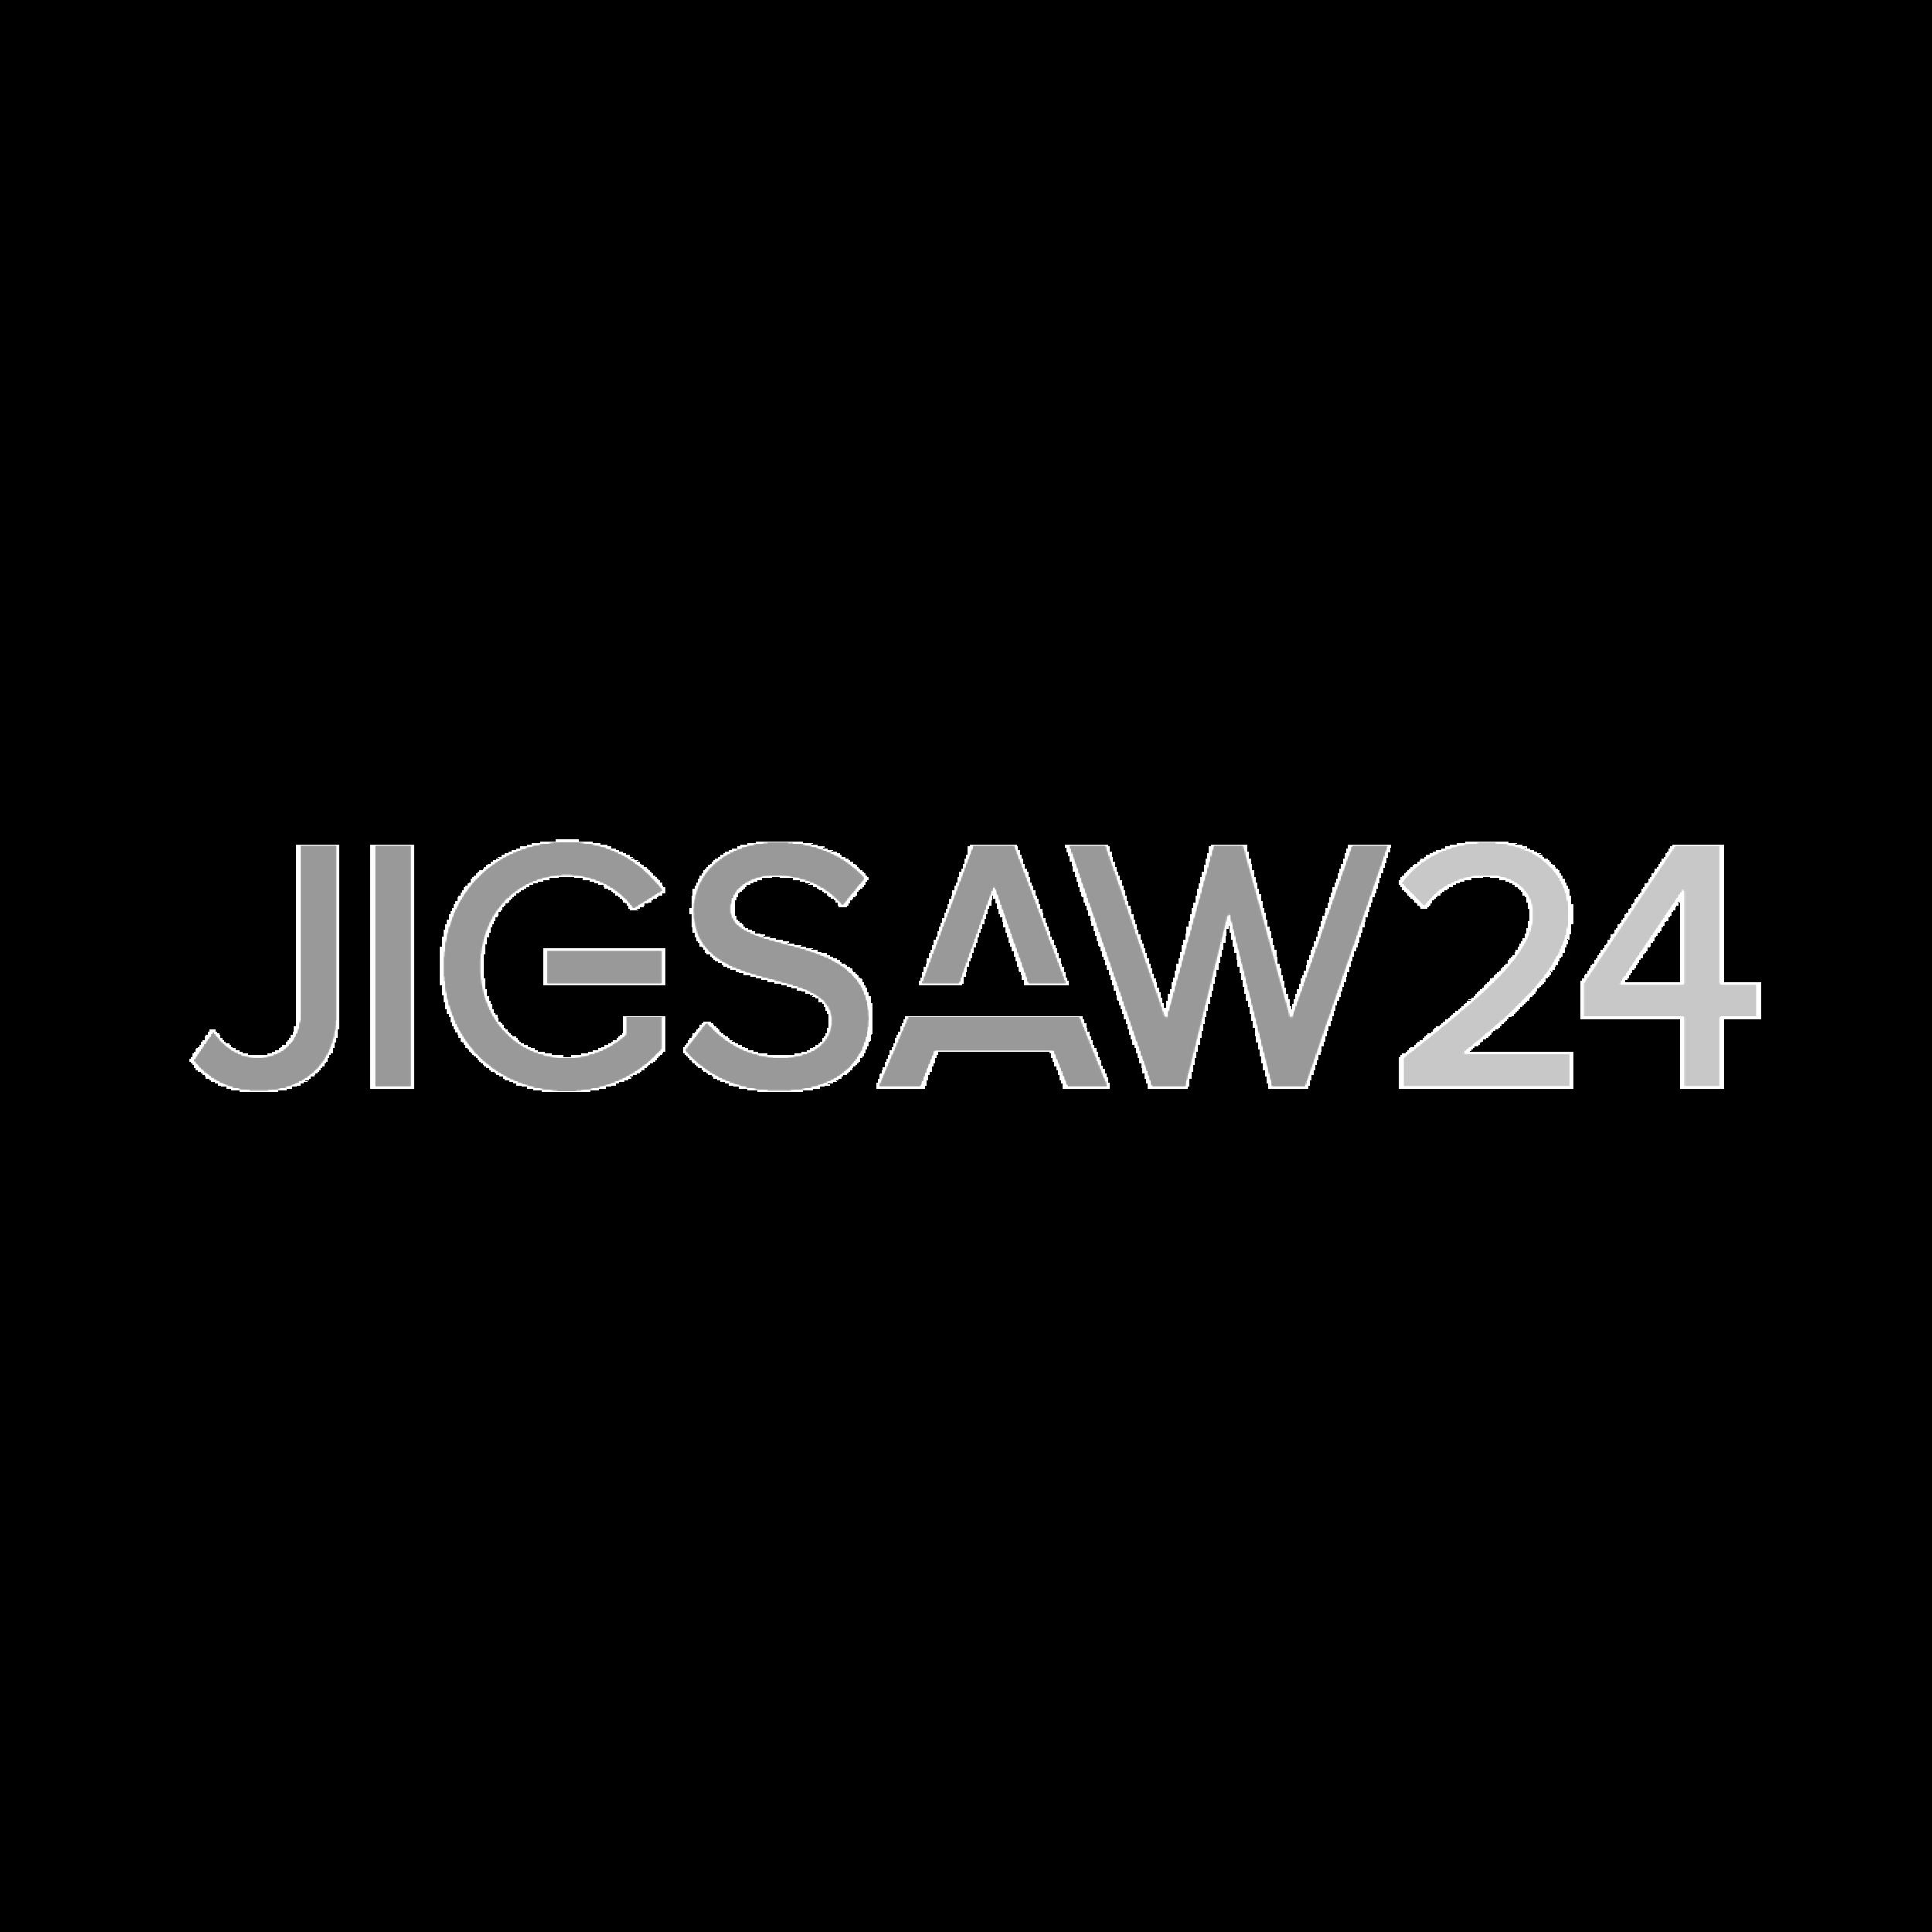 Jigsaw 24 Logo.png